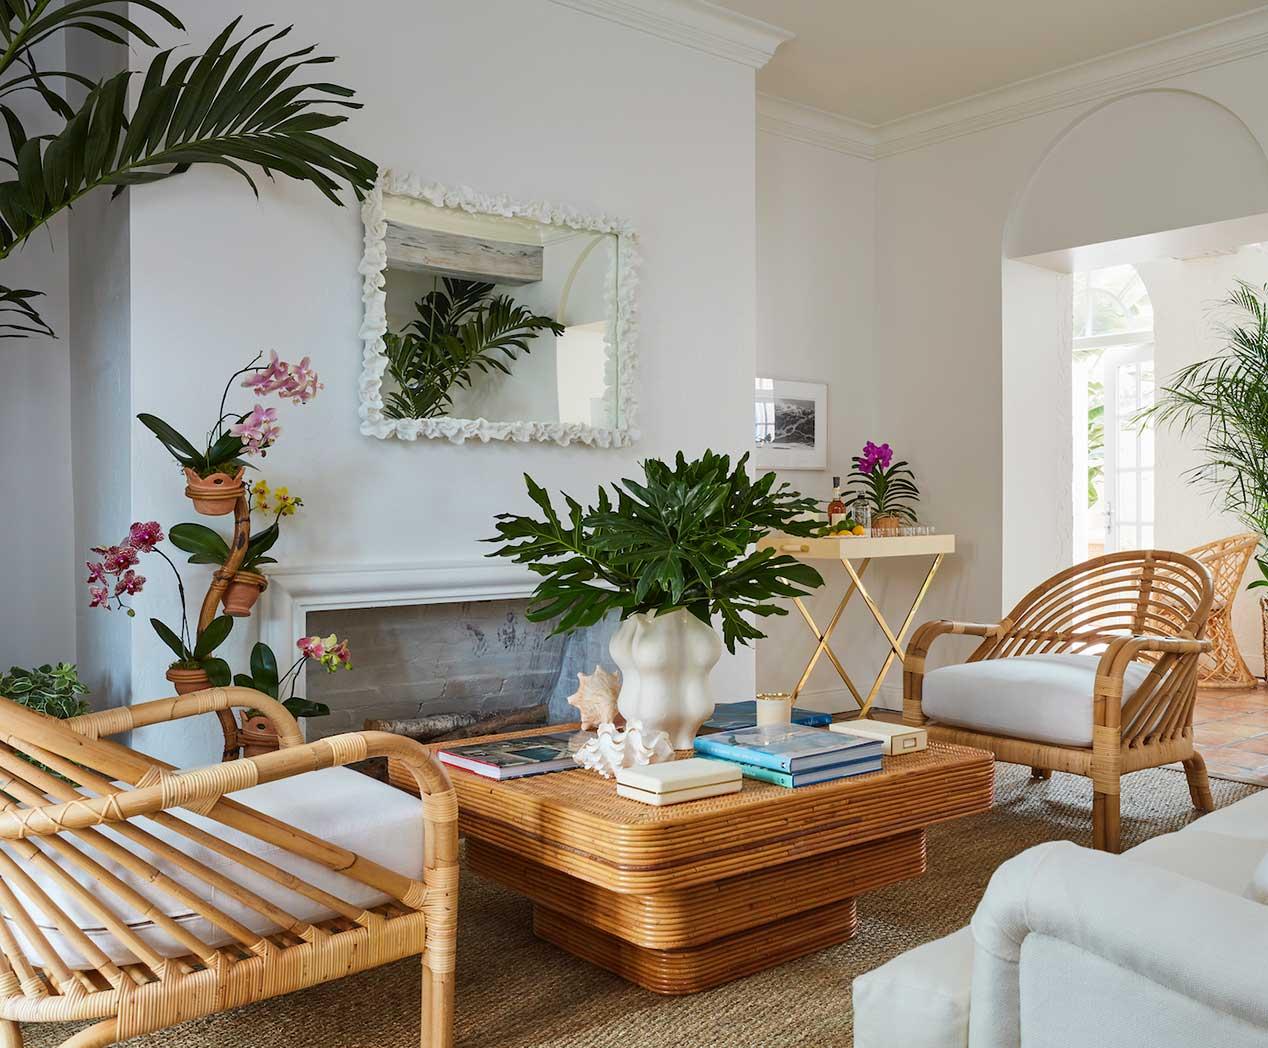 Villa-Jasmine-001---Elisabeth-Munder.jpg